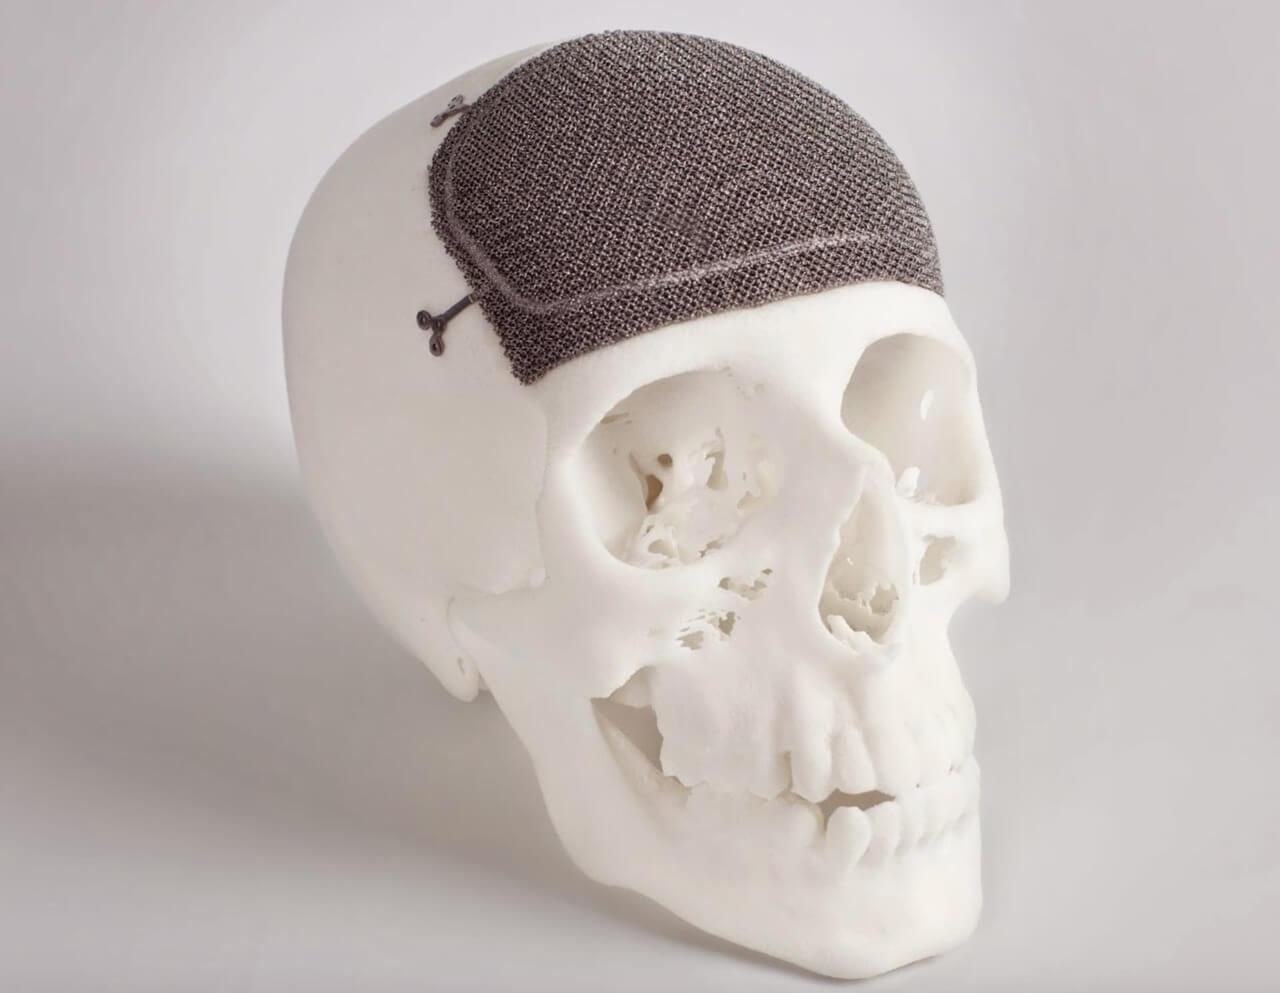 ebm 3d printed skull implant